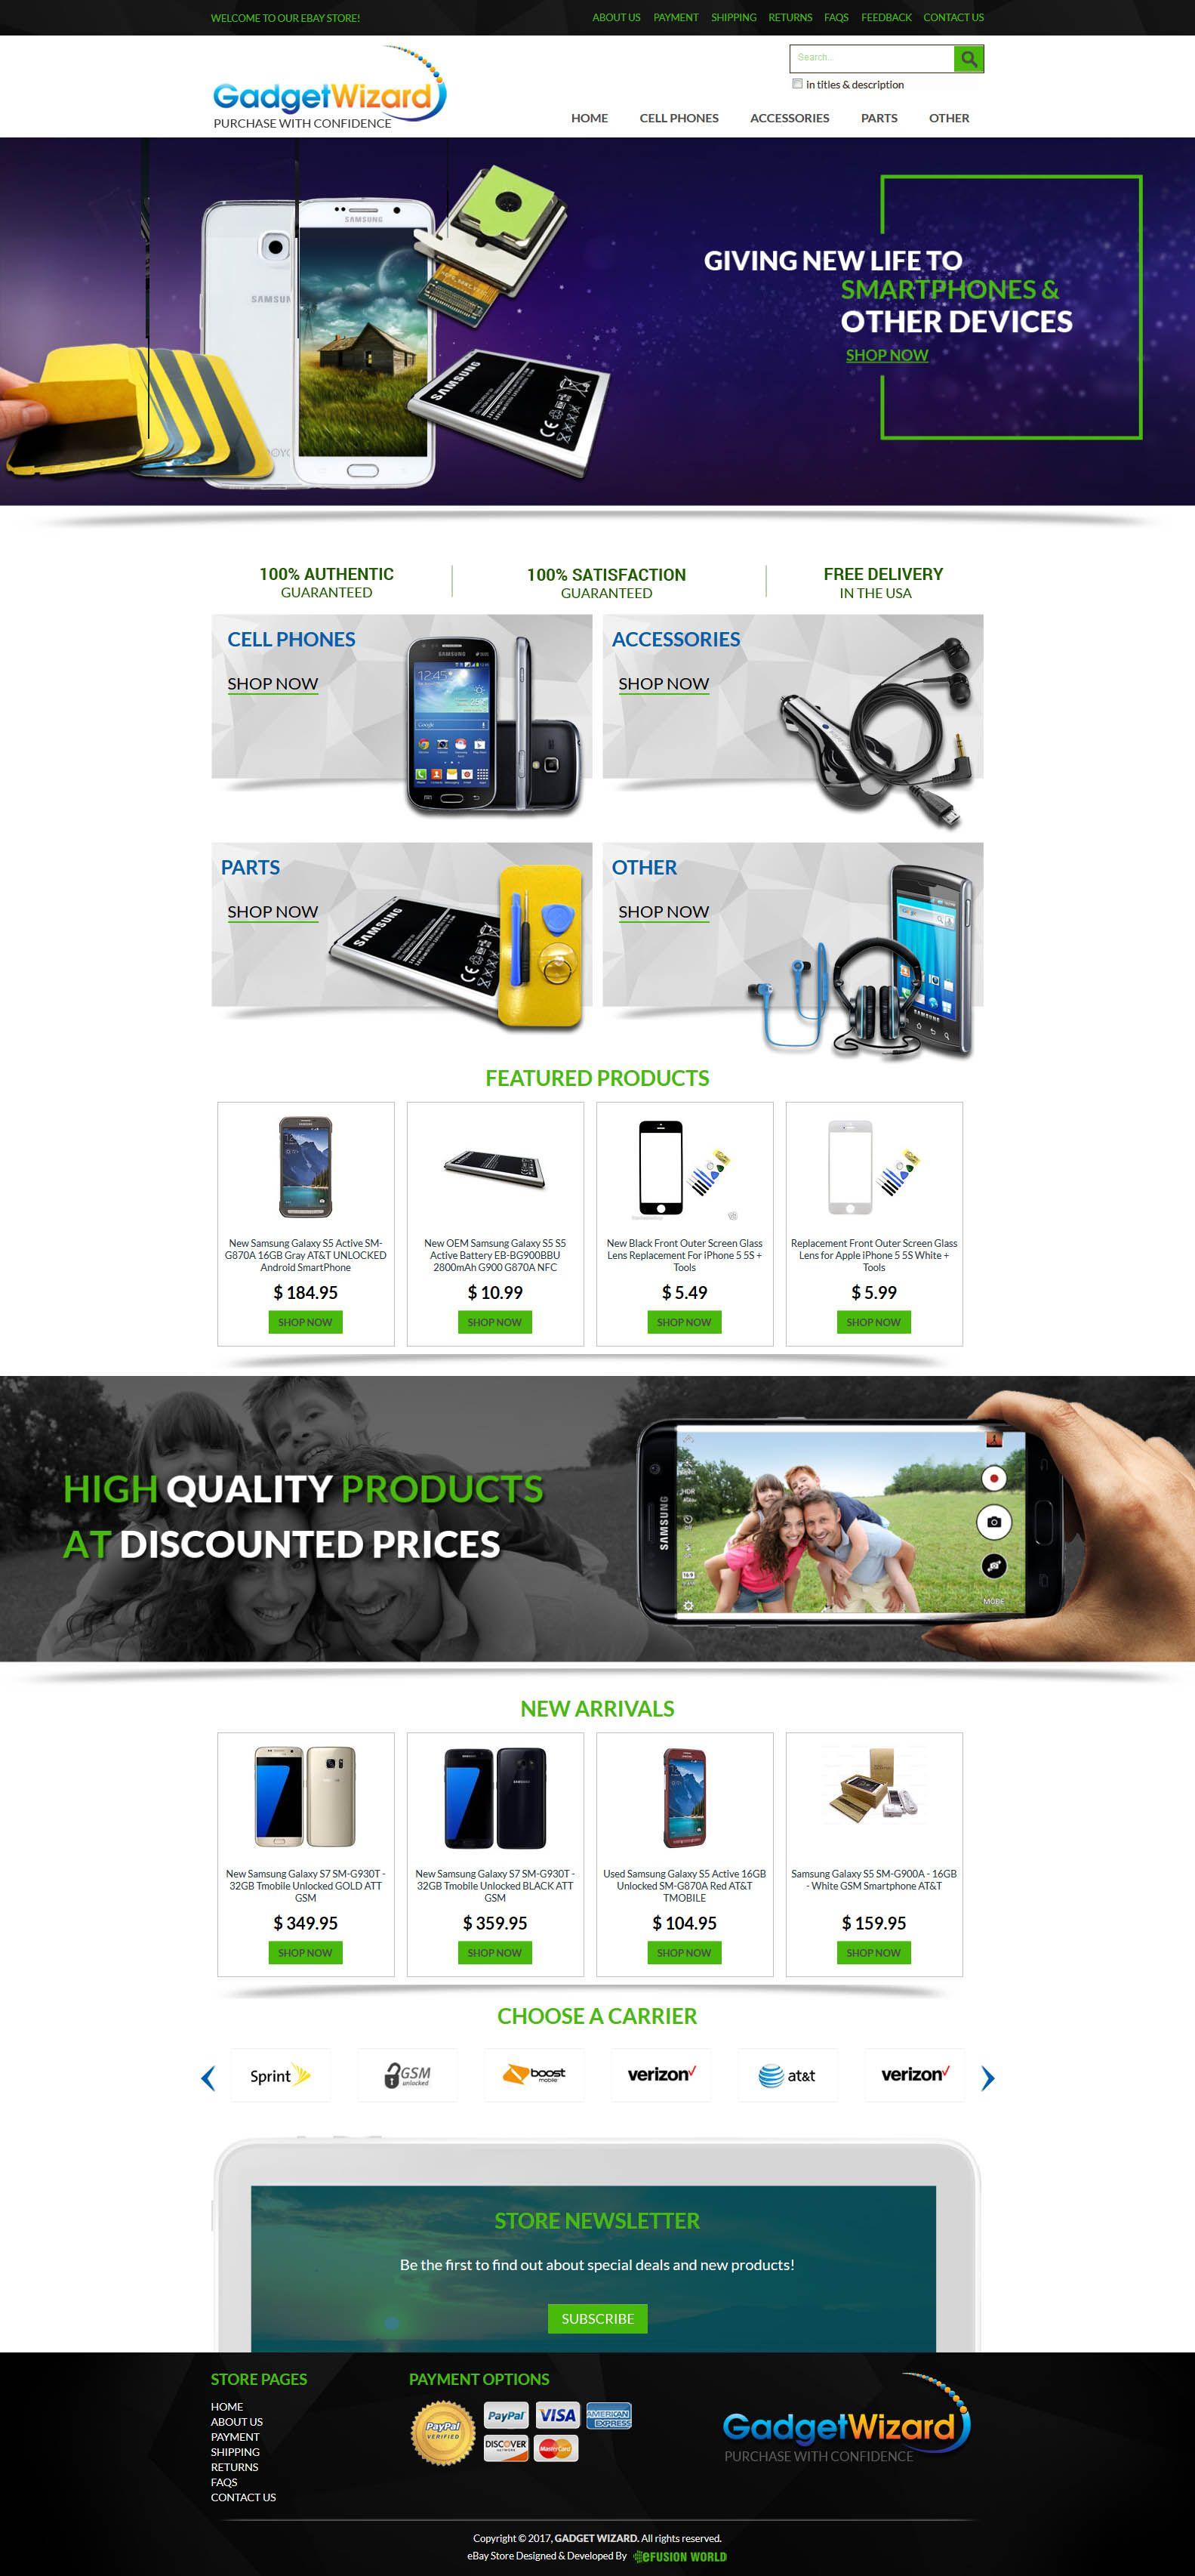 b4a88b014c  eFusionWorld s create stunning  eBay  Templates  design that optimized for  fast loading